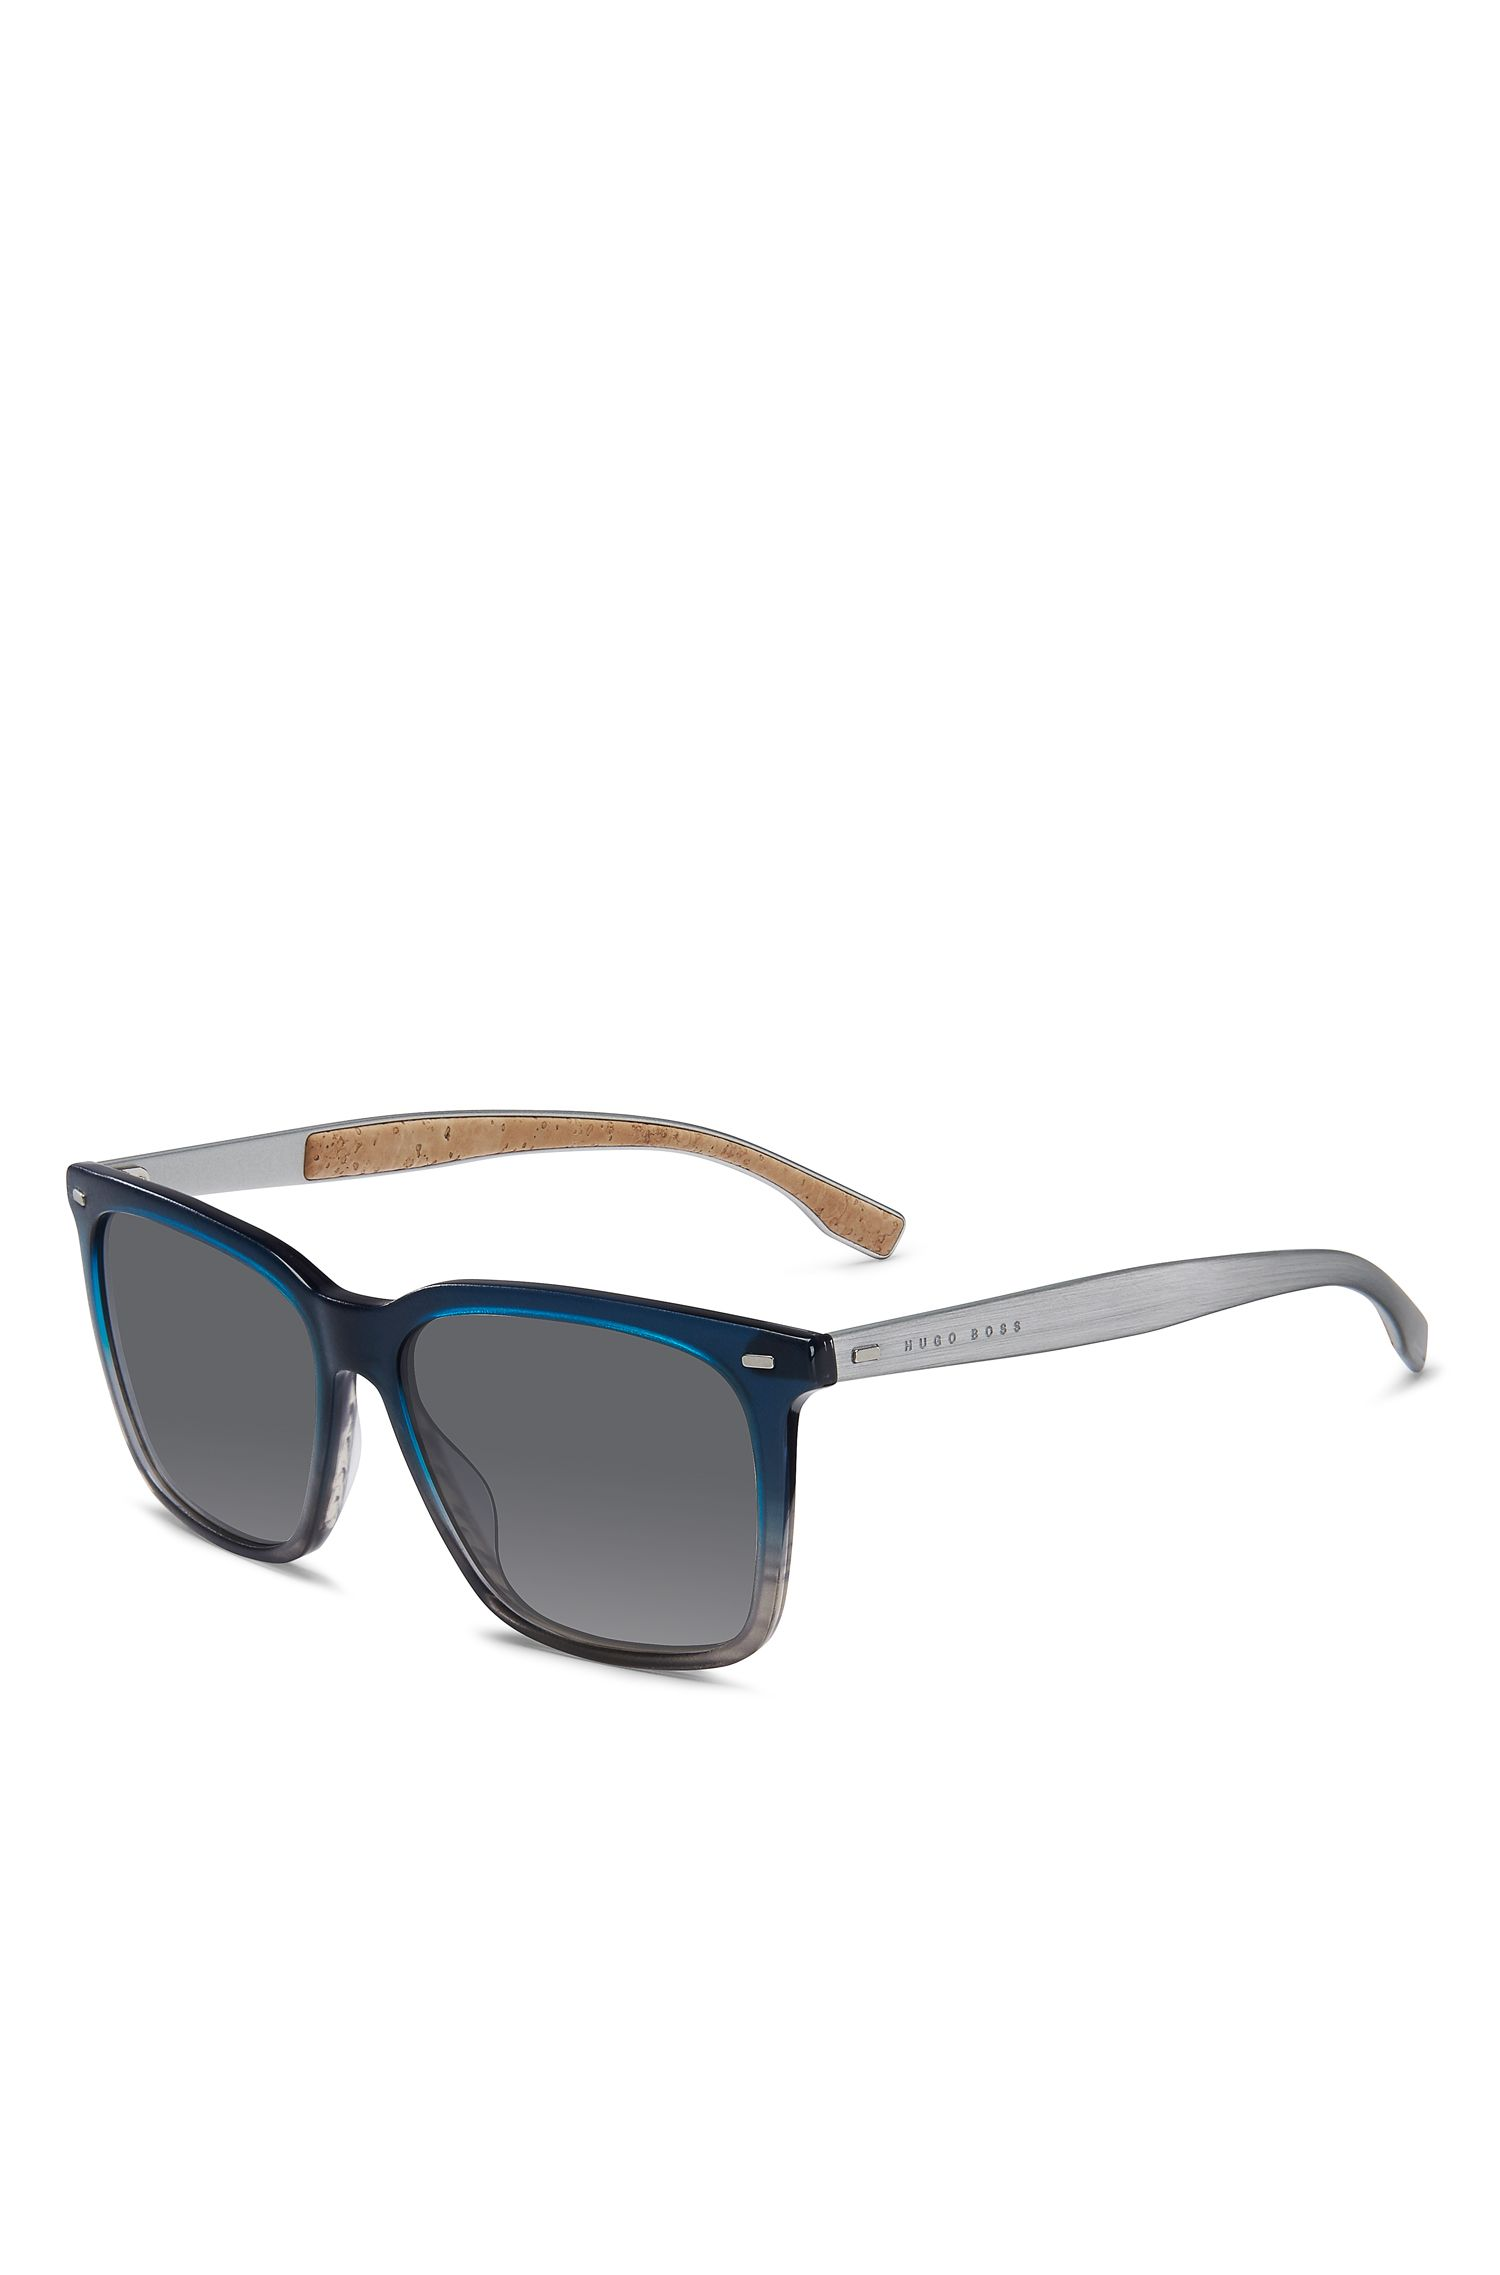 'BOSS 0883S'   Grey Acetate Rectangular Sunglasses